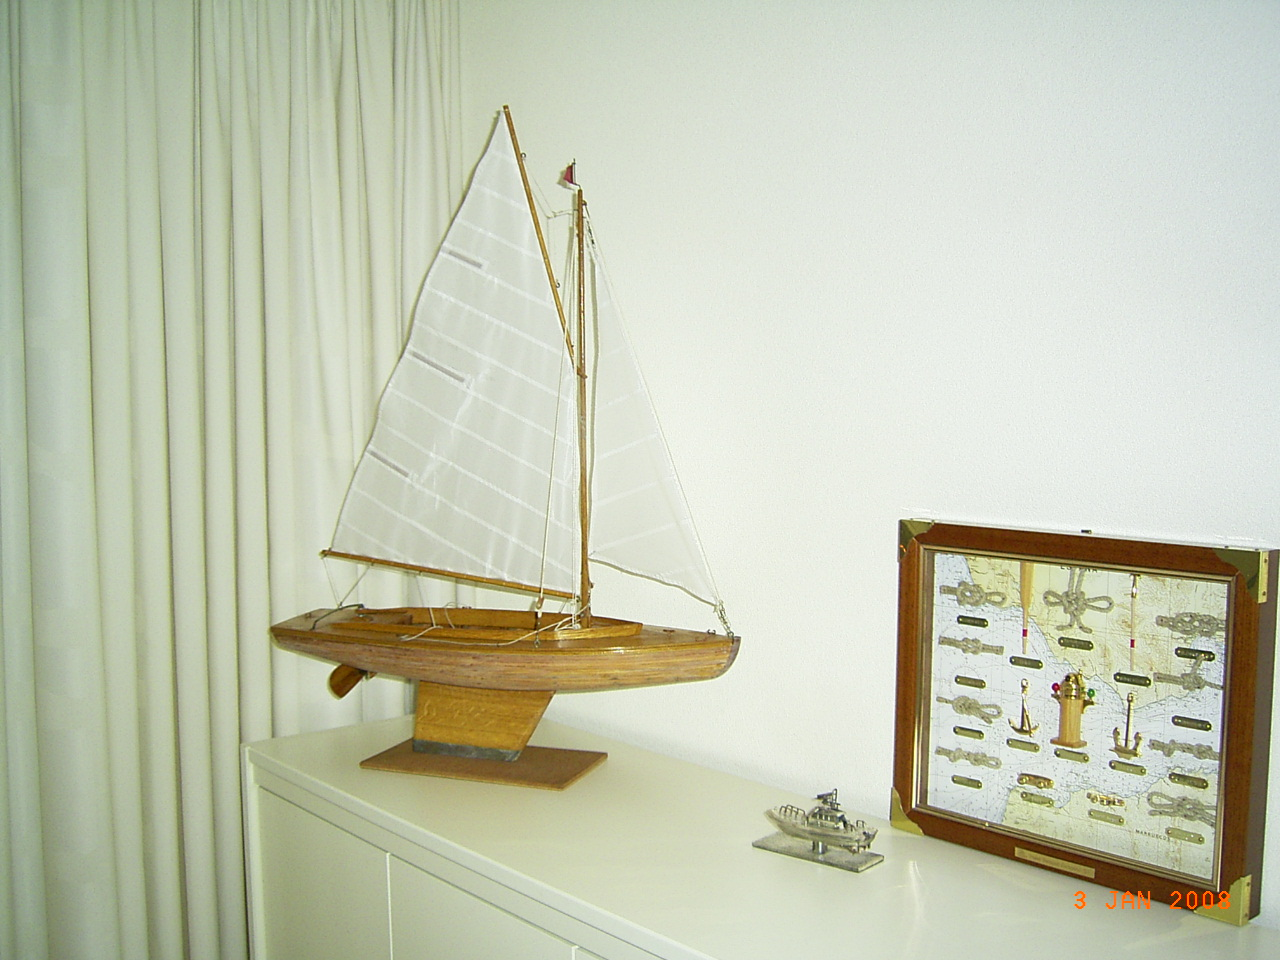 RIMG3398.JPG